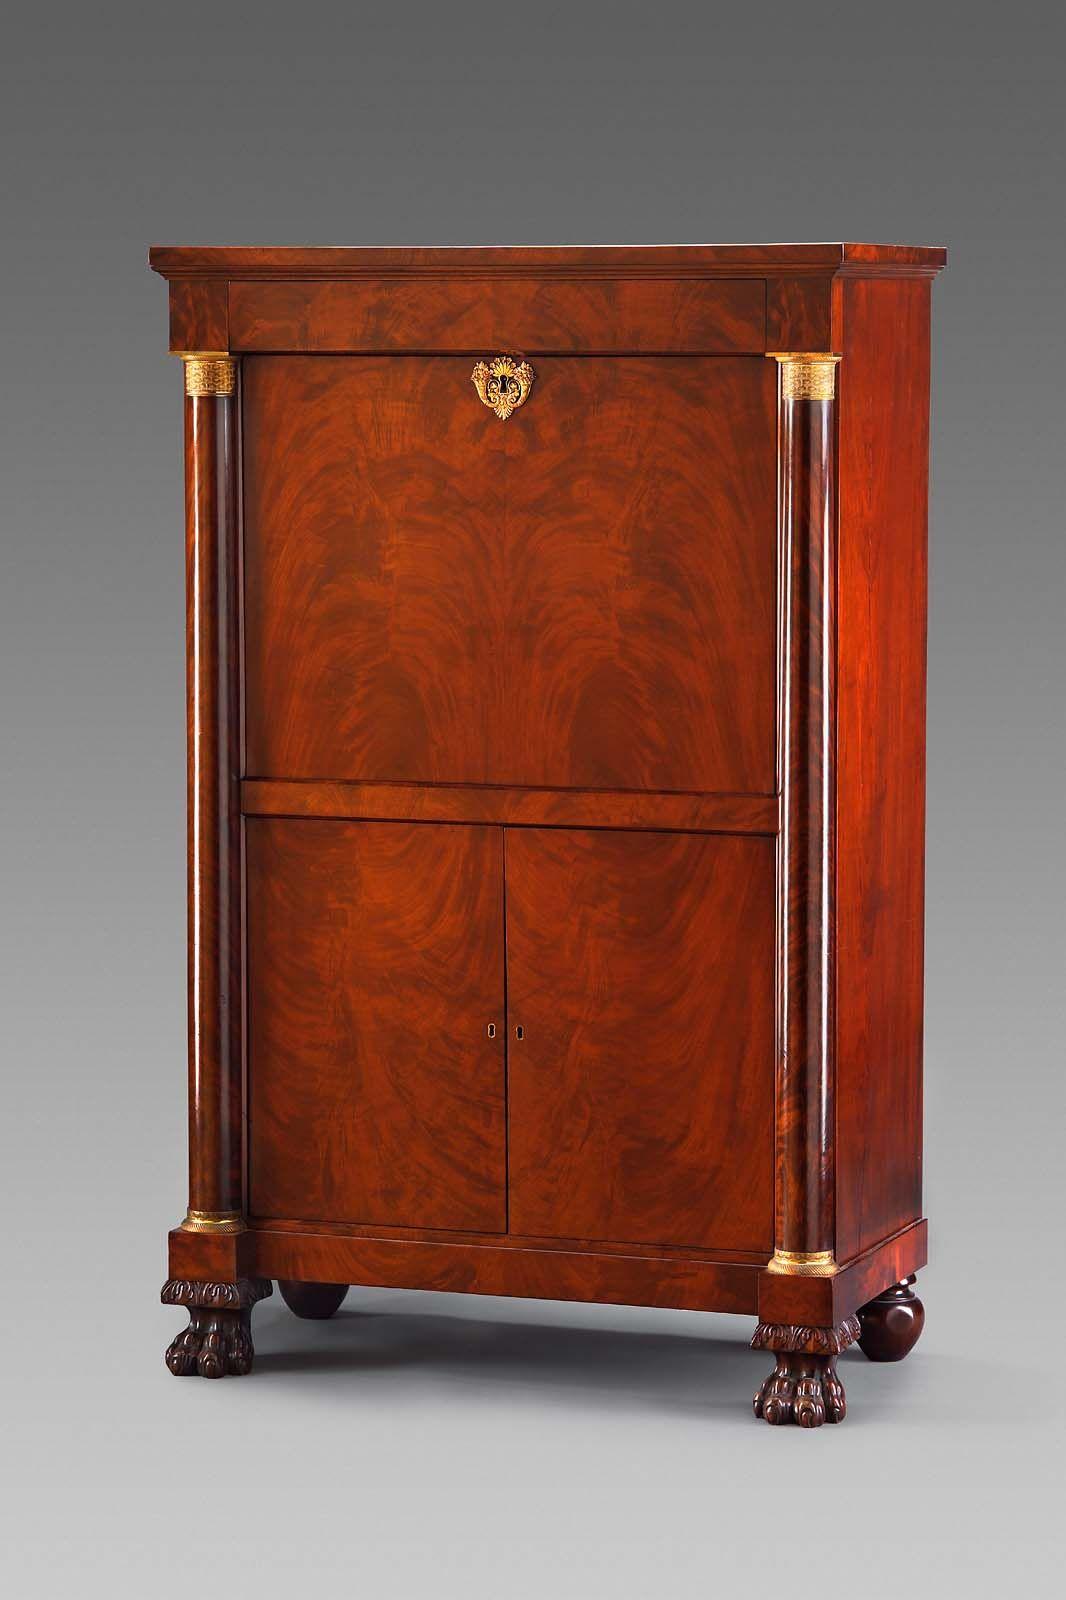 c1820 Classical secrétaire à abbattant, Emmons & Archibald, Boston (active1813-25), mah, 61t, mfa, Boston.